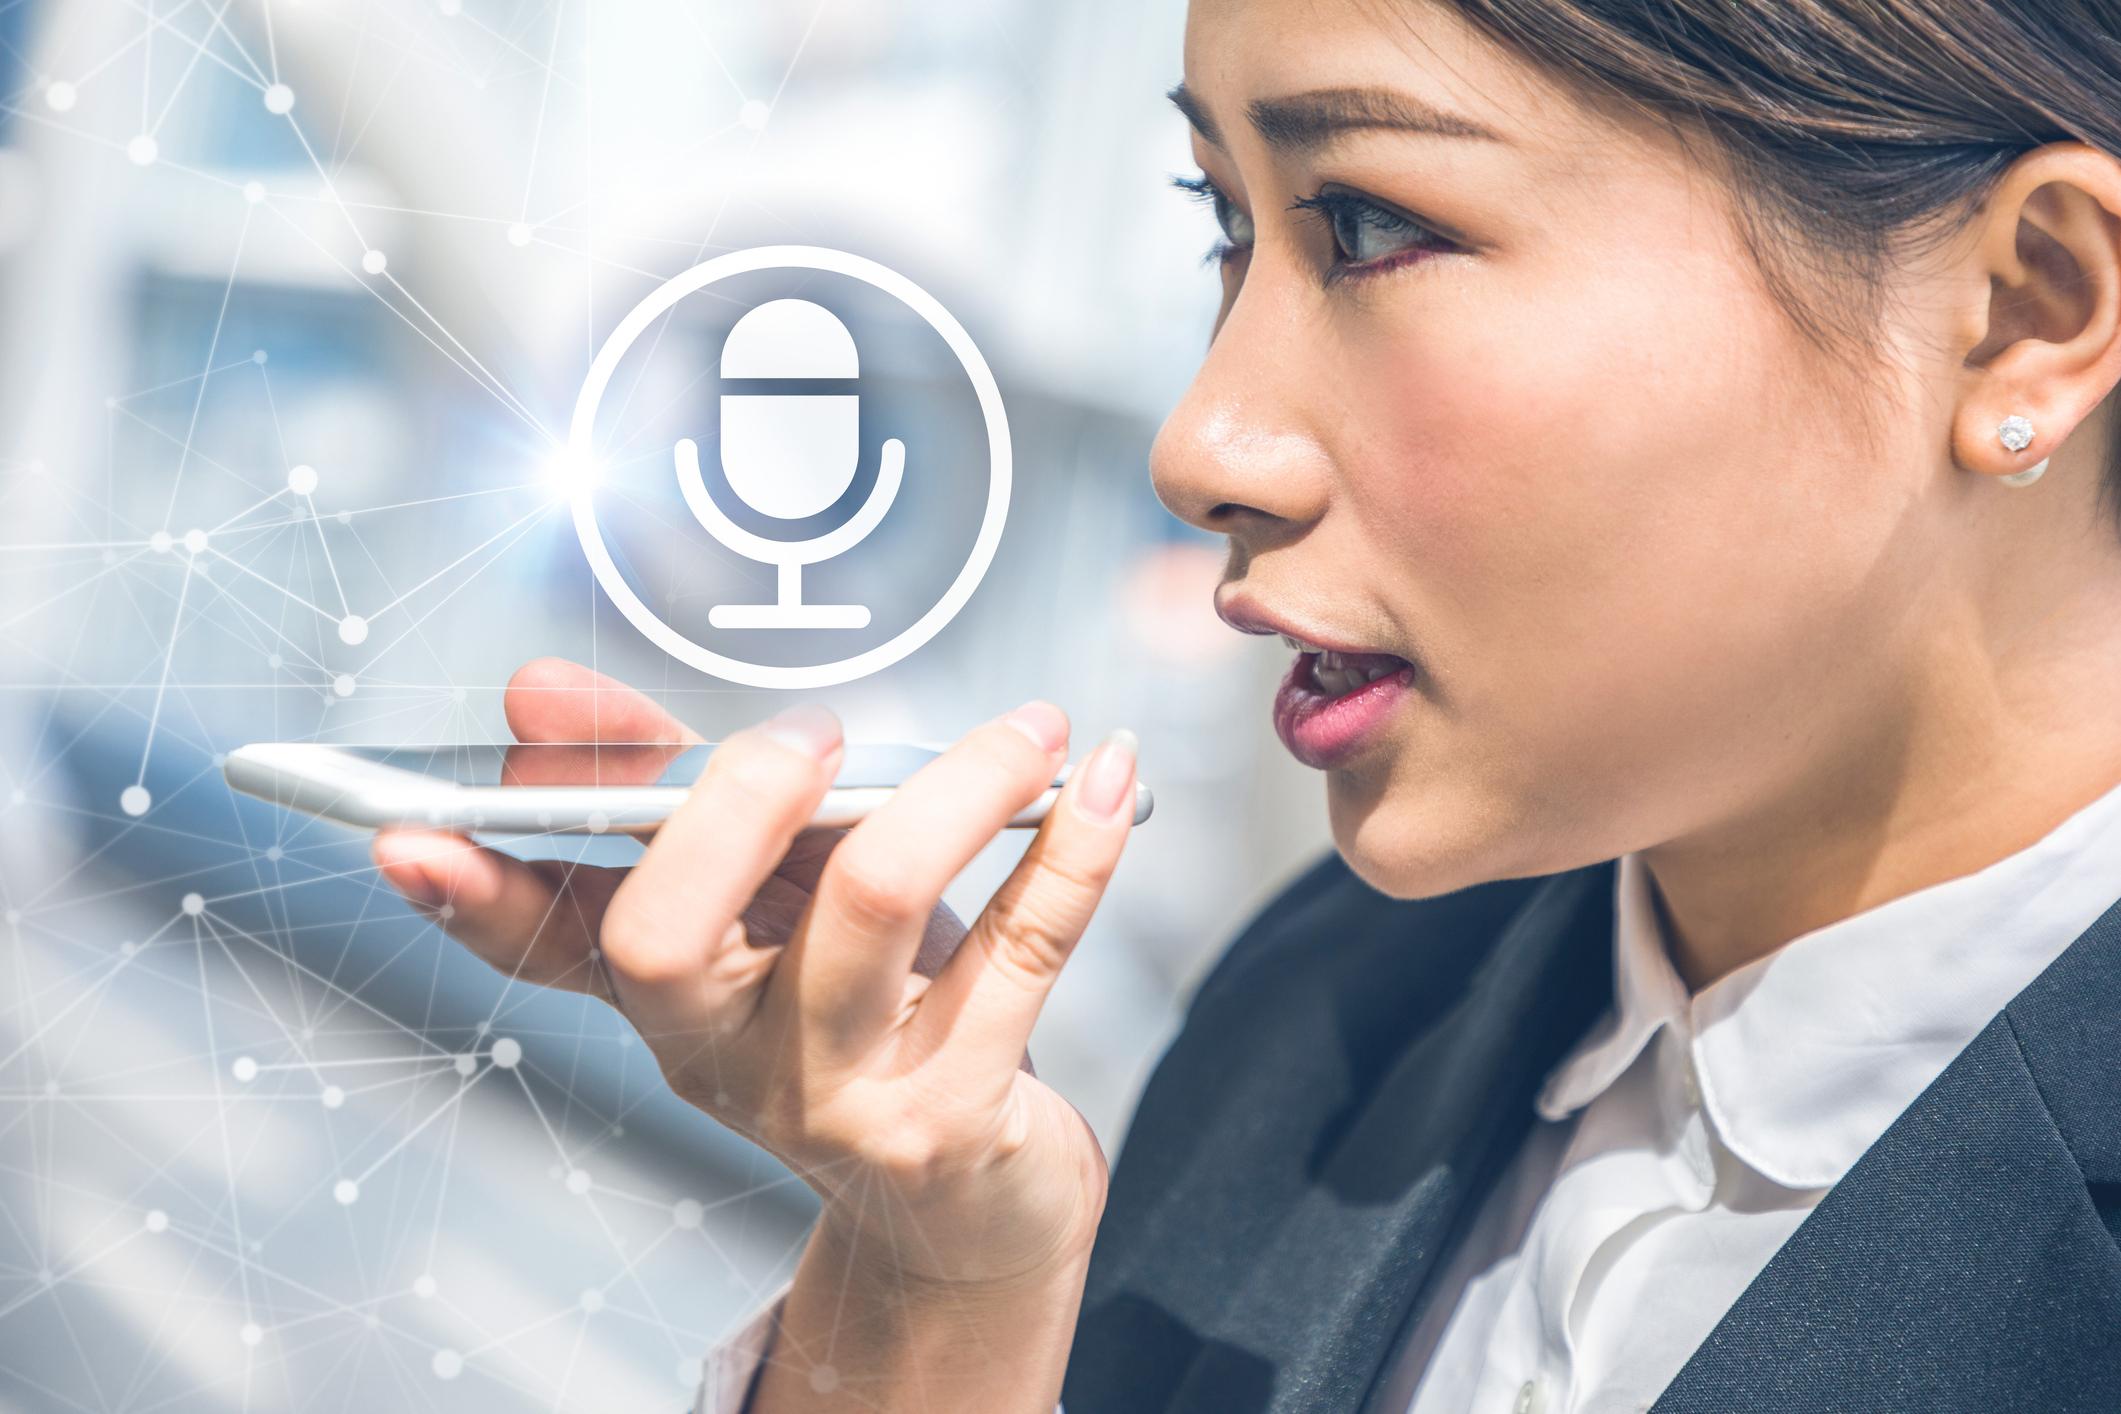 search query through voice device